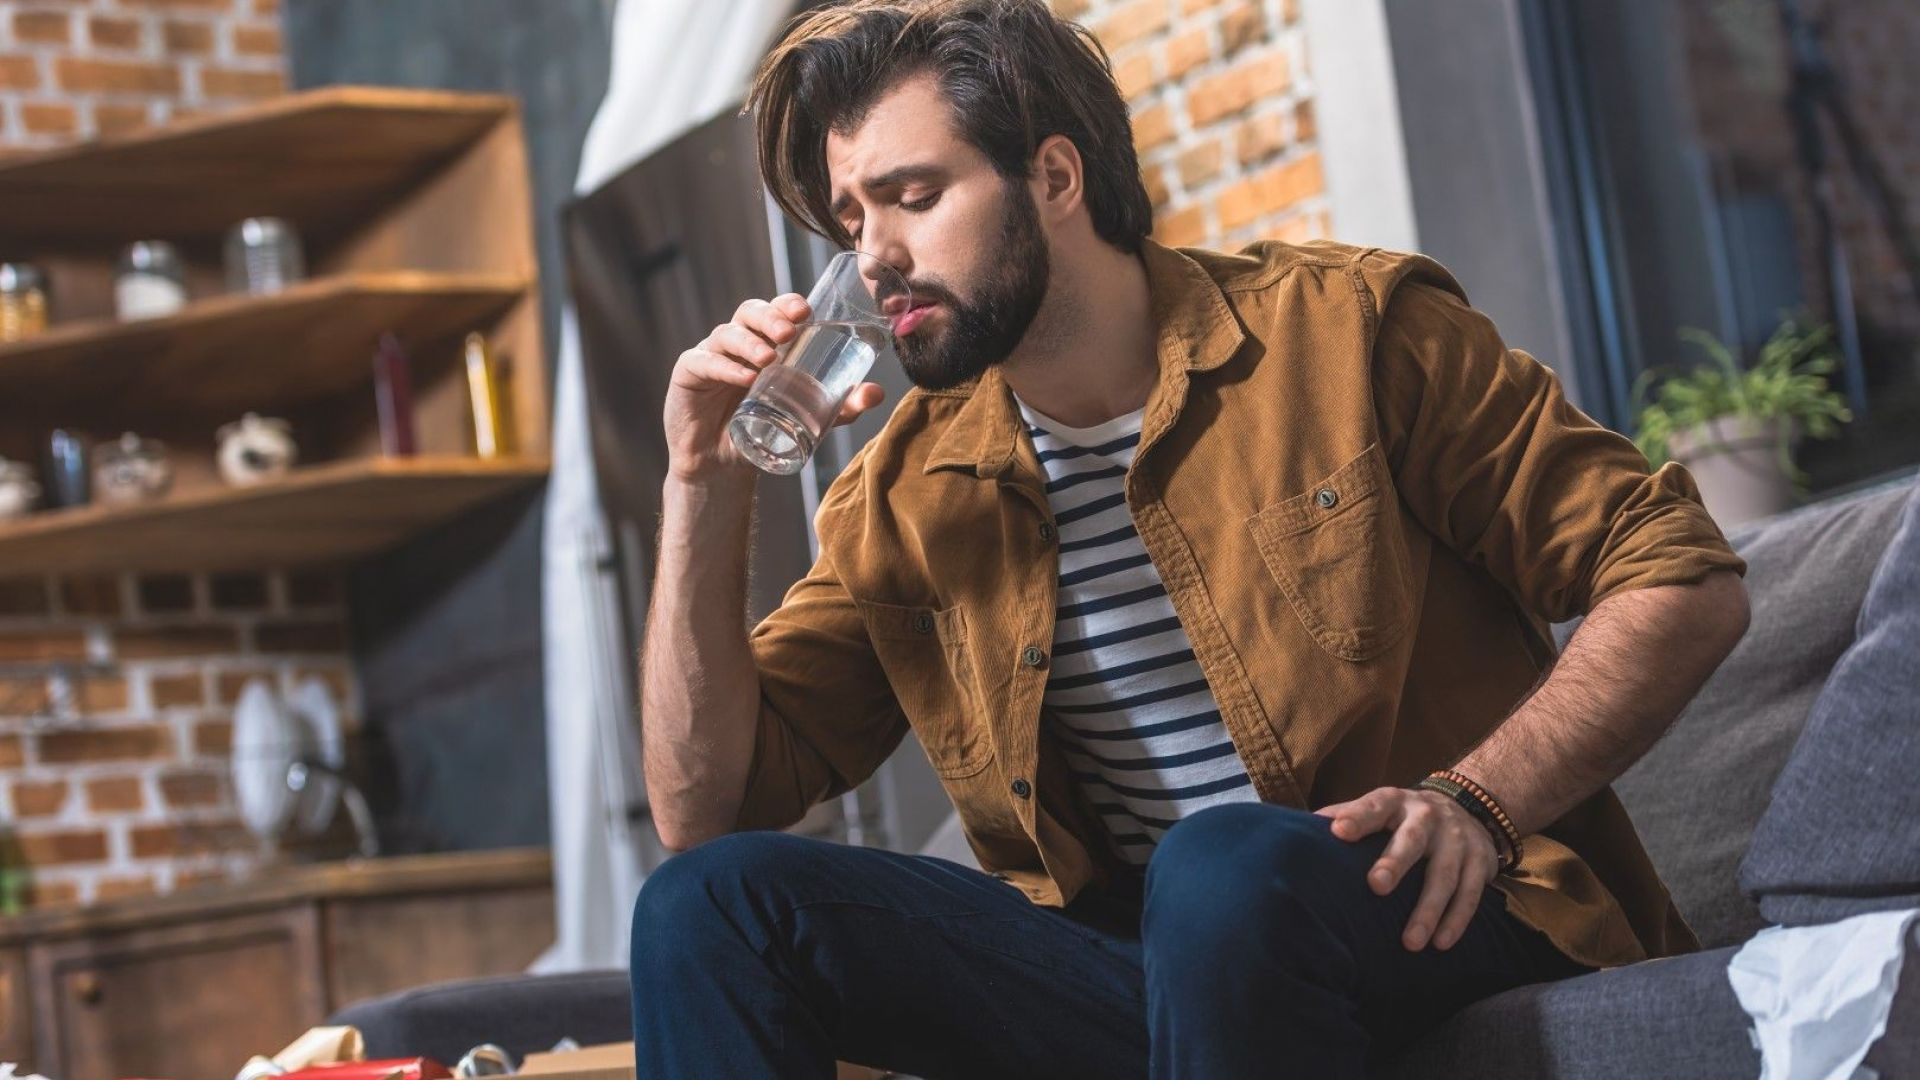 Честата употреба на алкохол води до дългосрочна загуба на памет